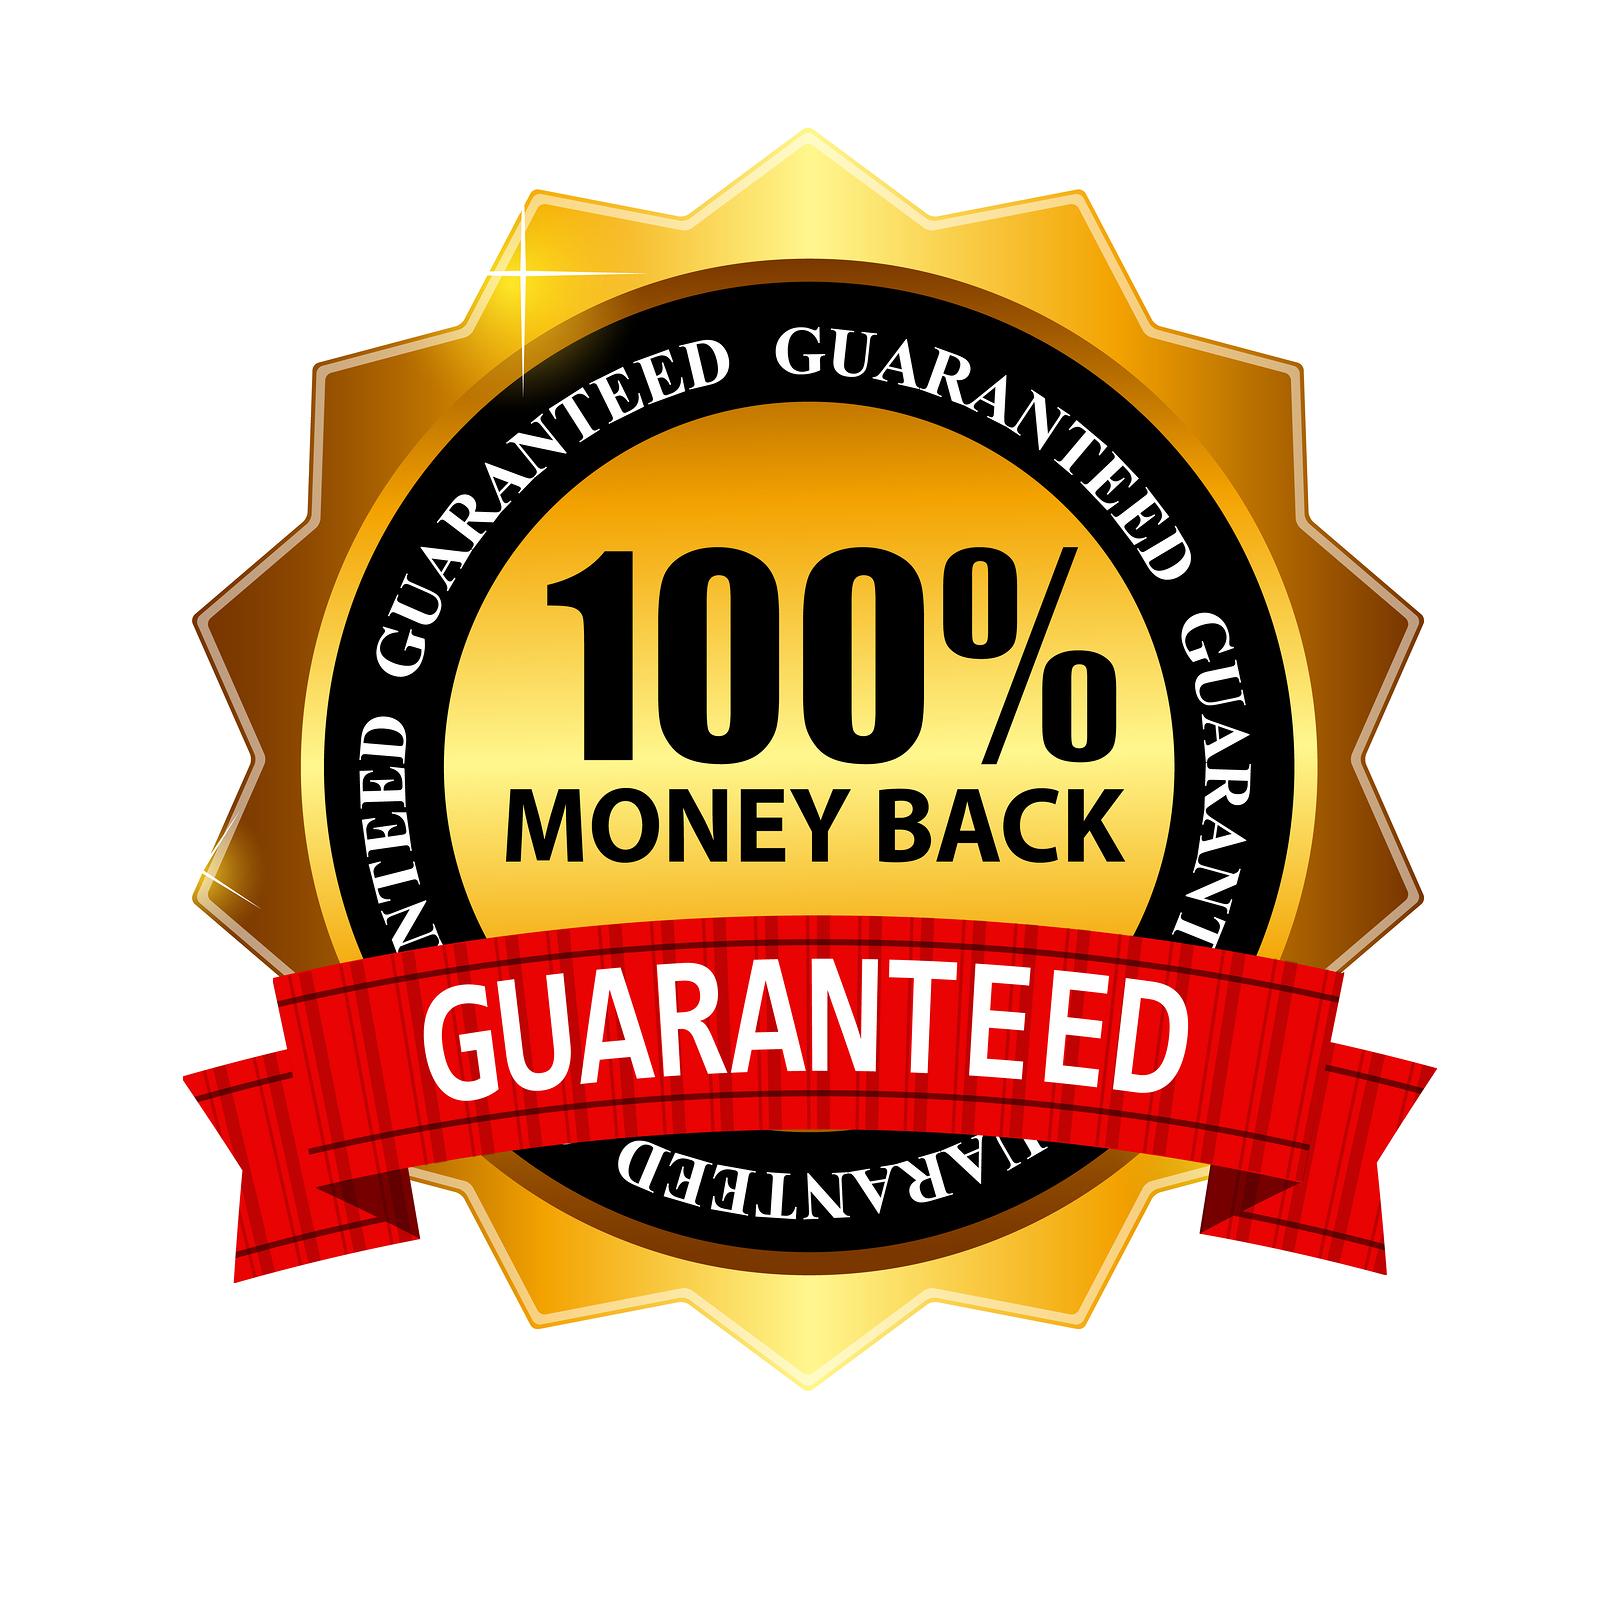 Hq transparent images pluspng. Money back guarantee png